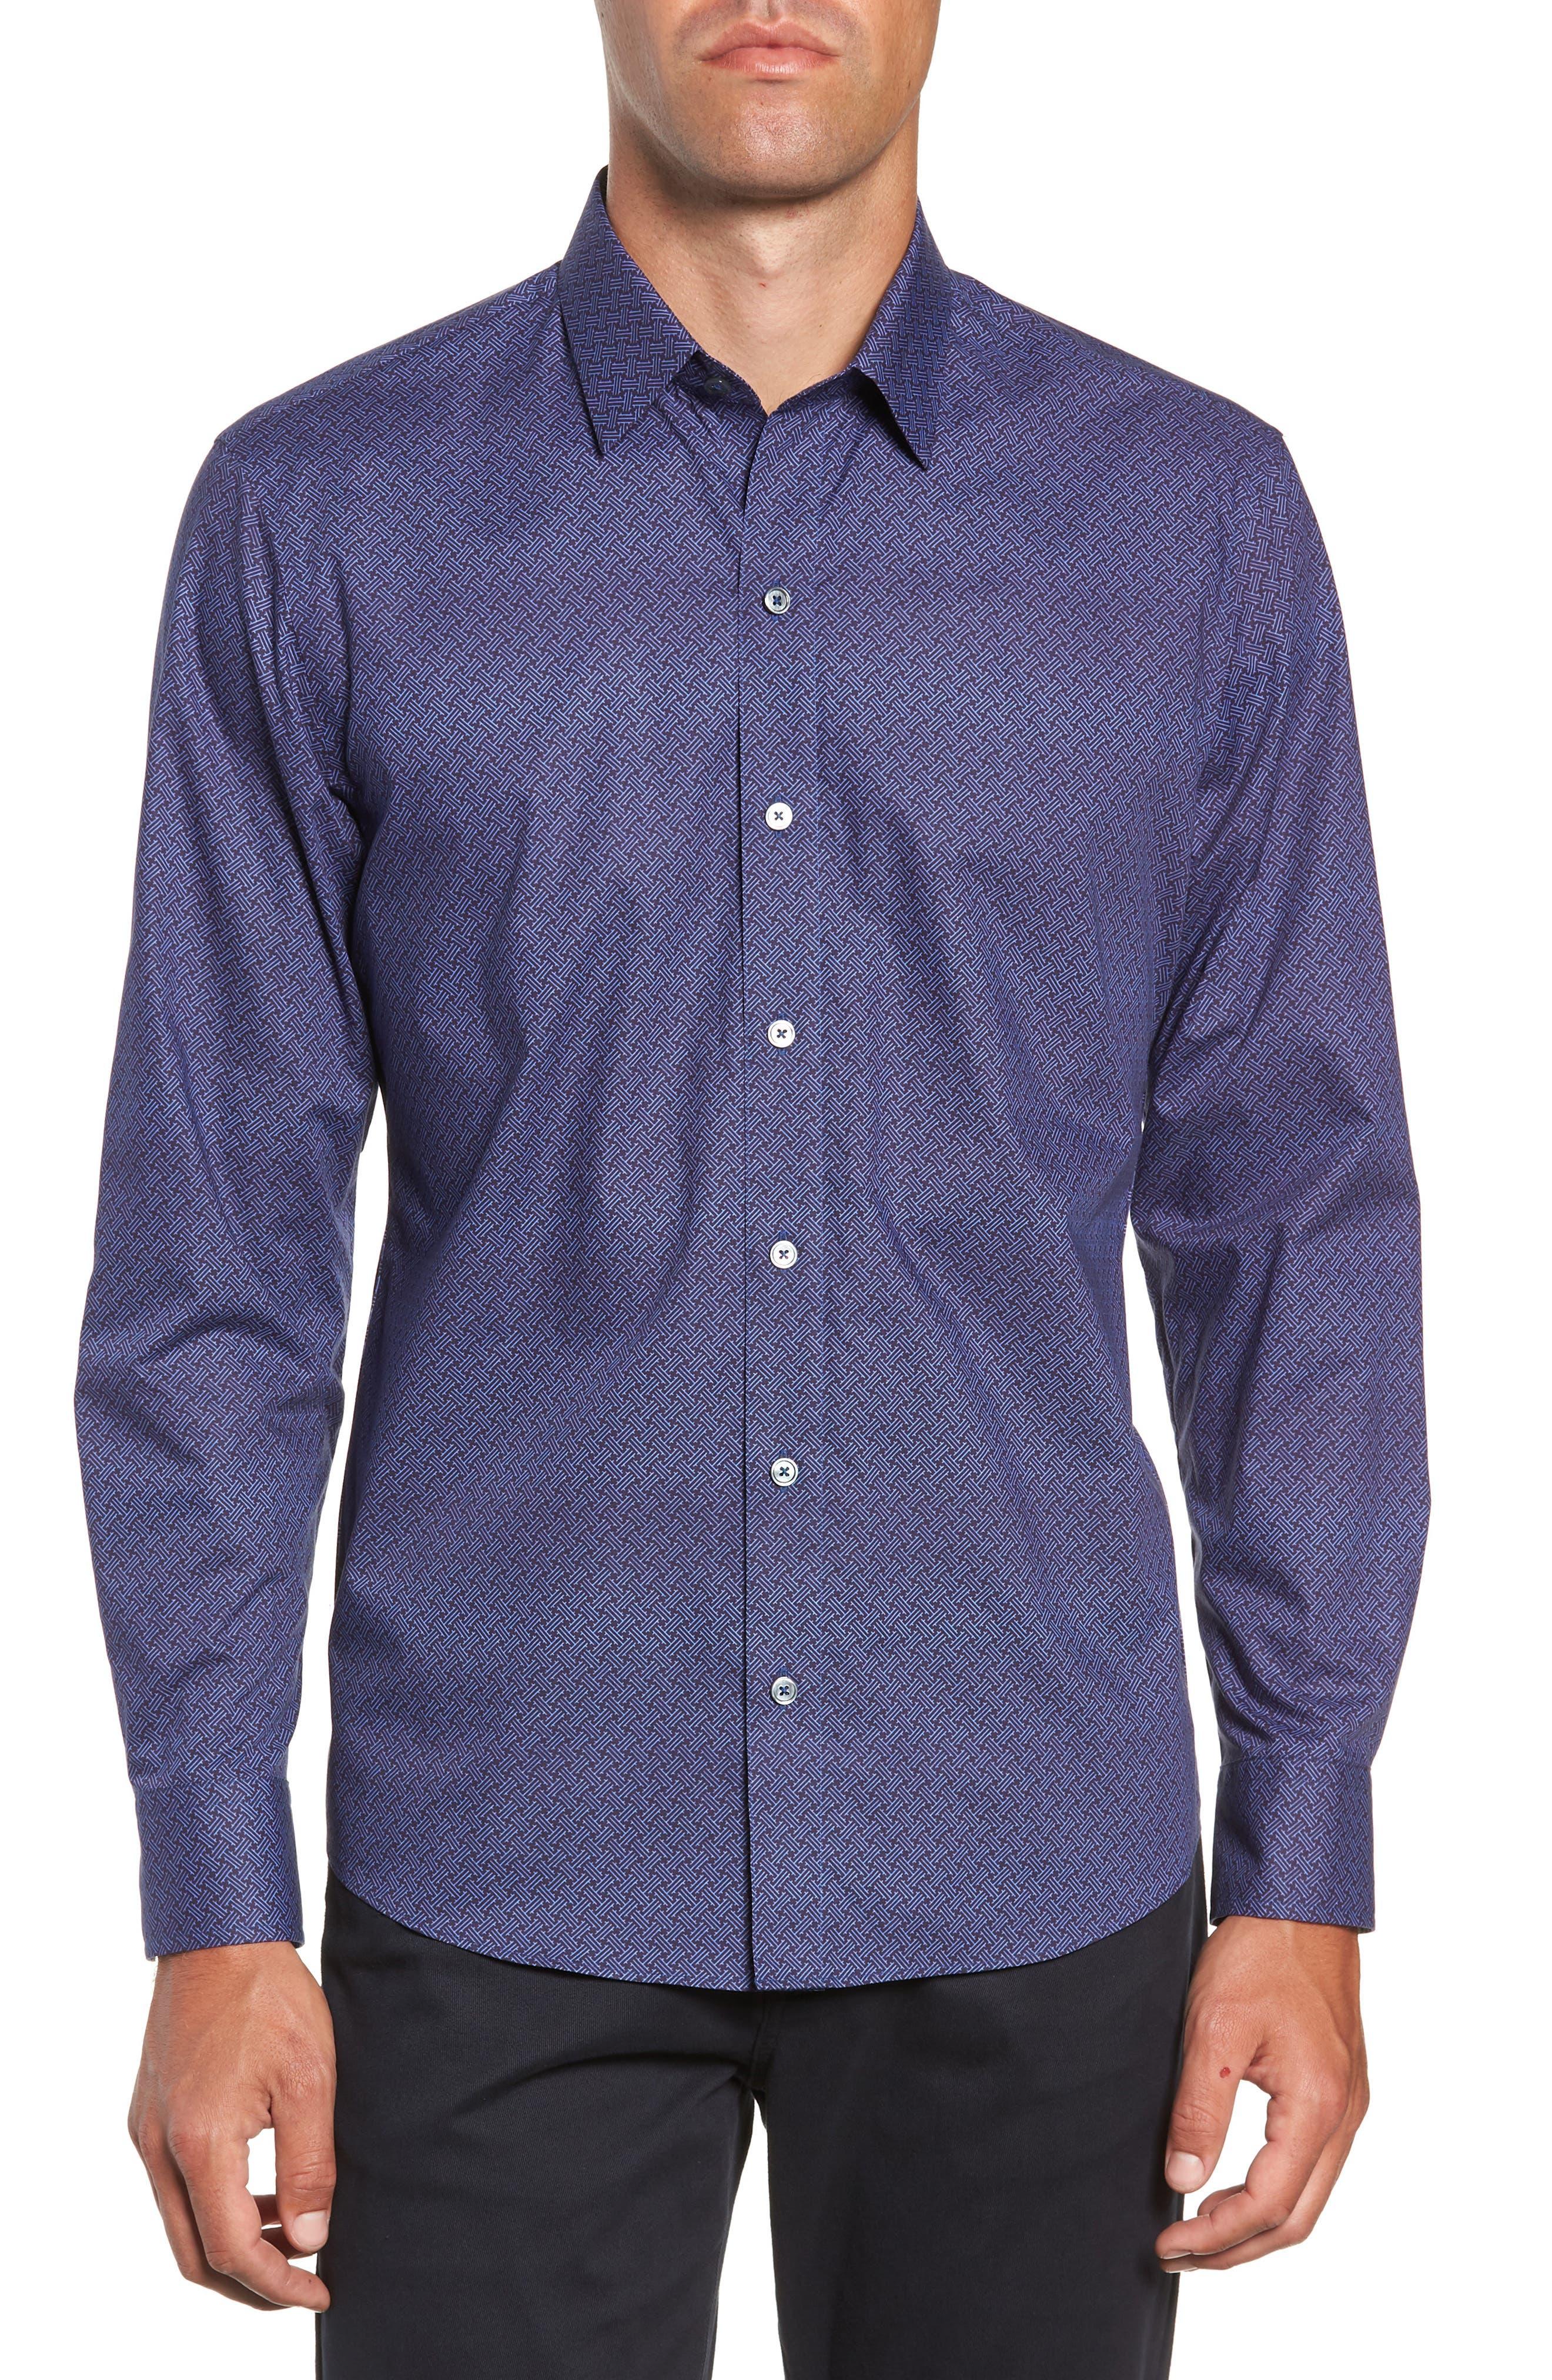 Singh Regular Fit Sport Shirt,                         Main,                         color, NAVY